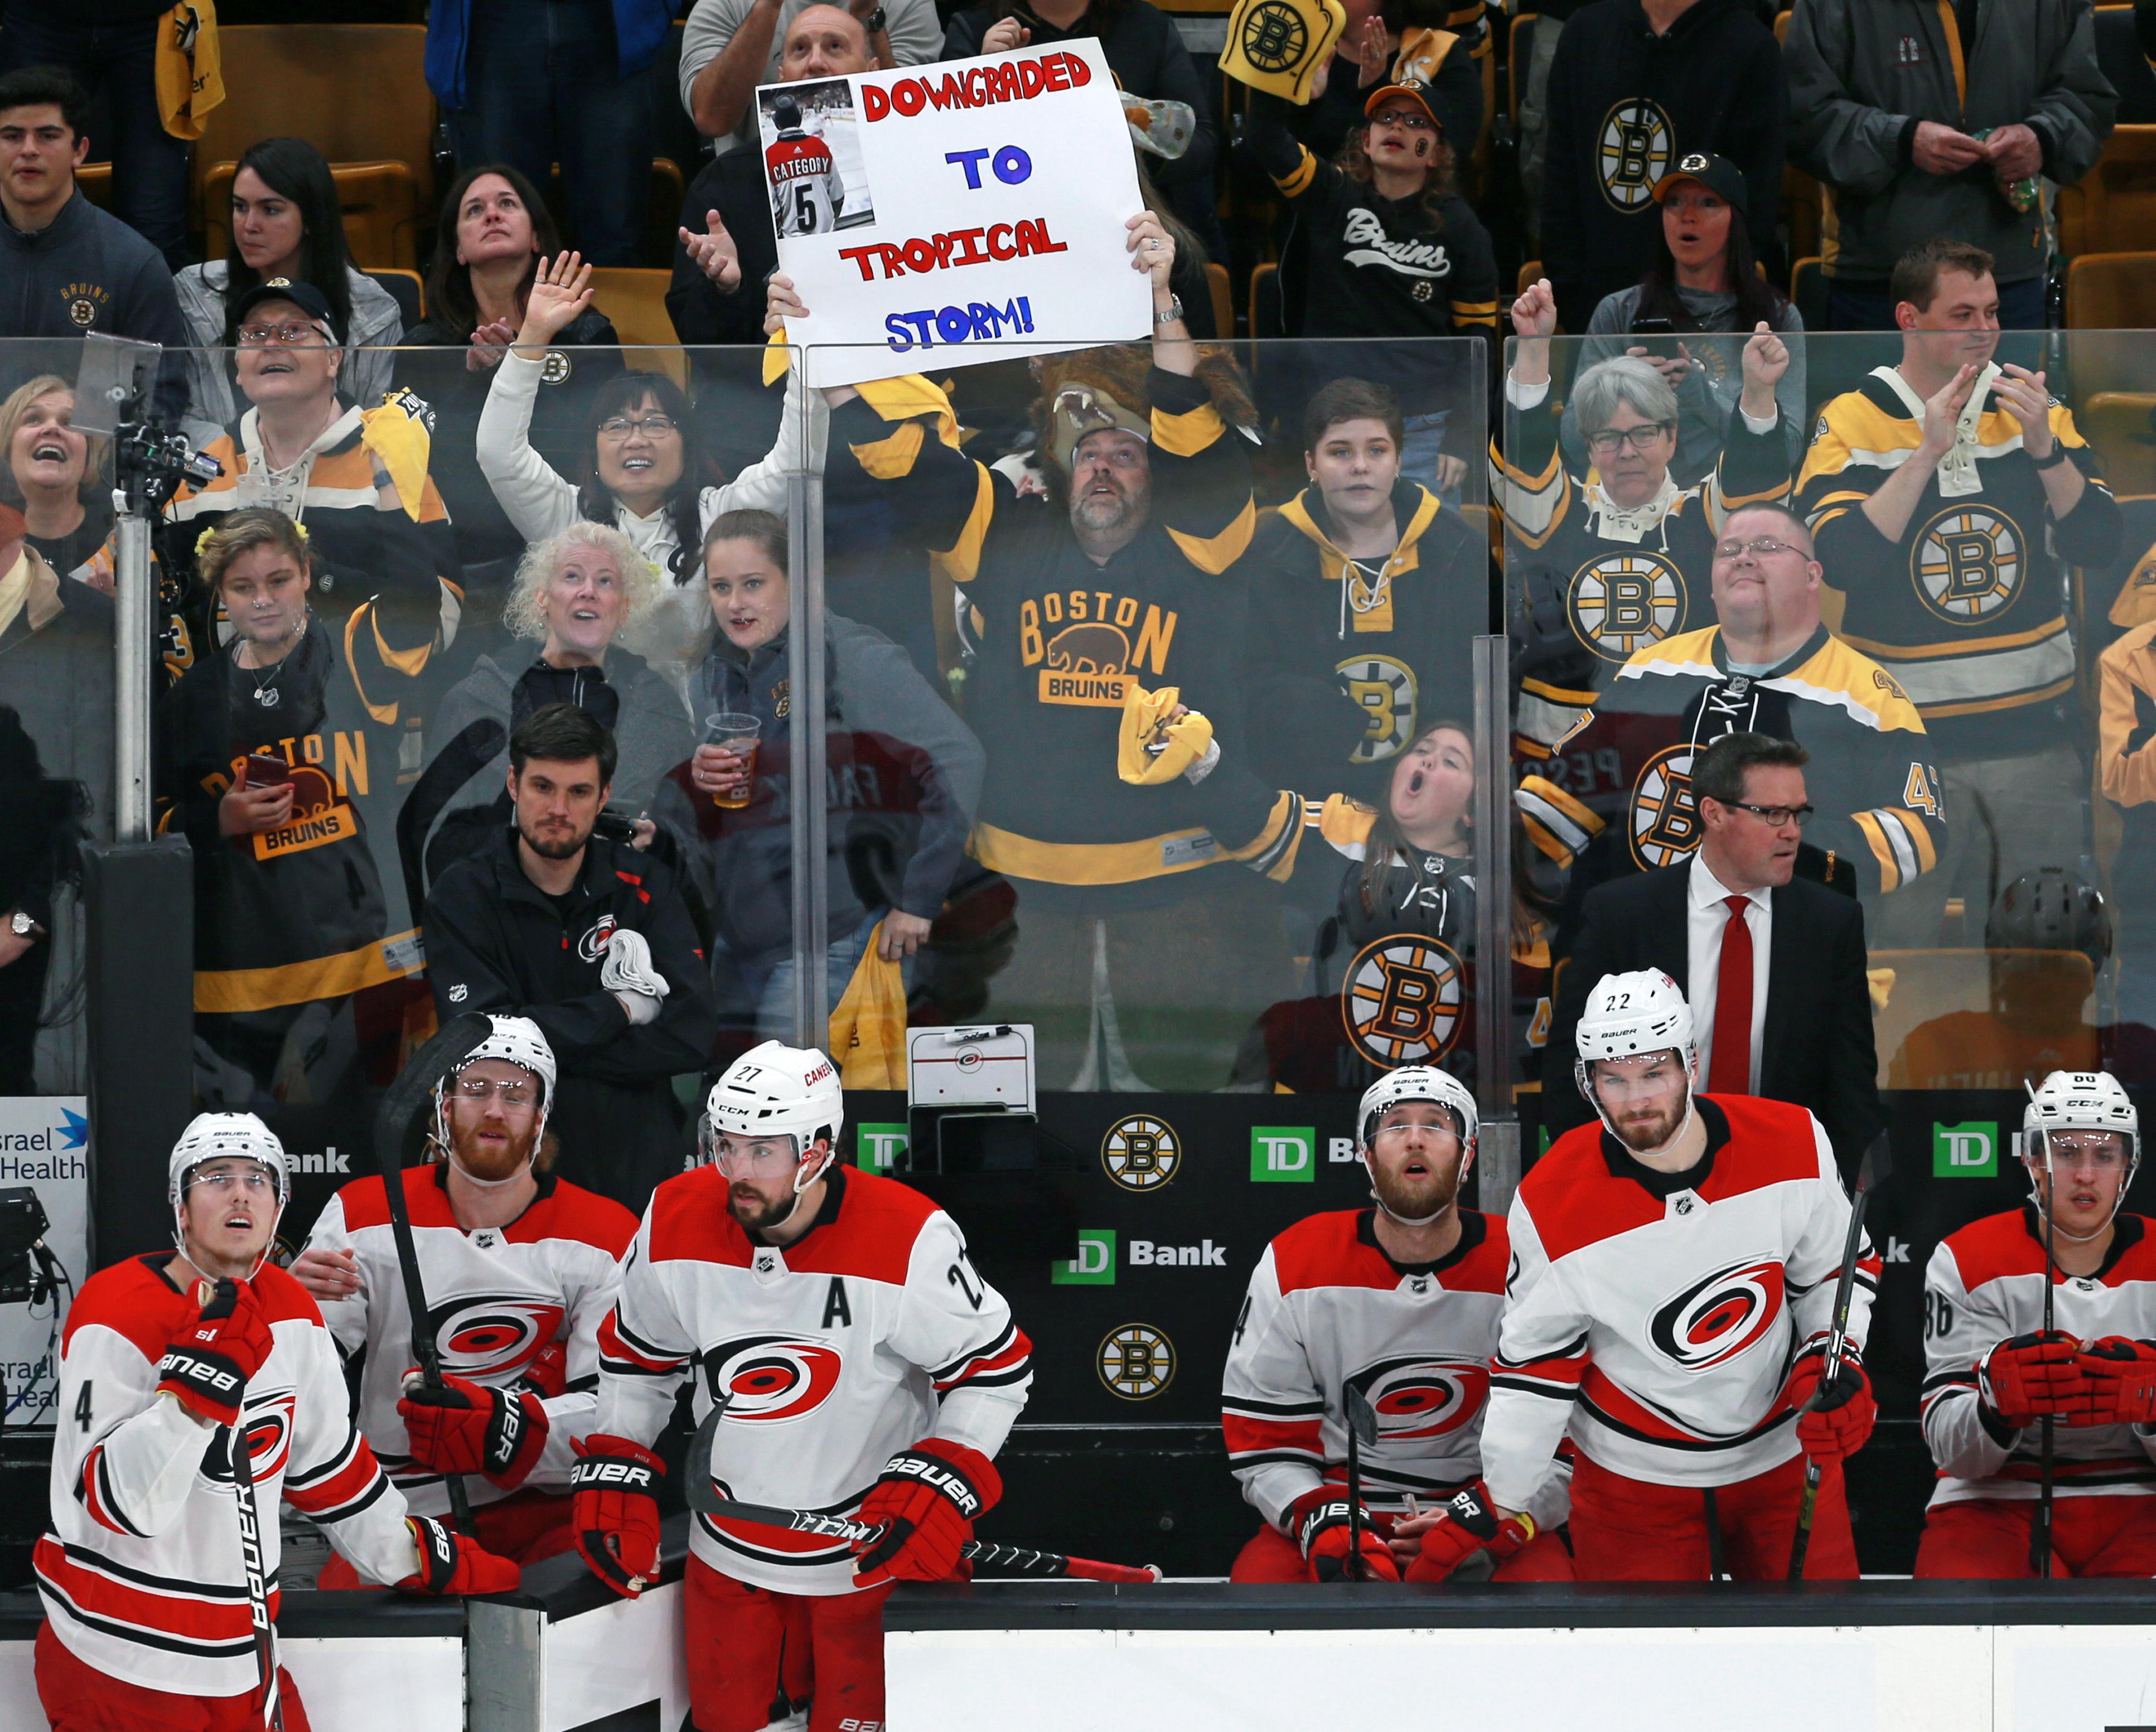 2019 Stanley Cup Playoffs: Carolina Hurricanes Vs Boston Bruins At TD Garden